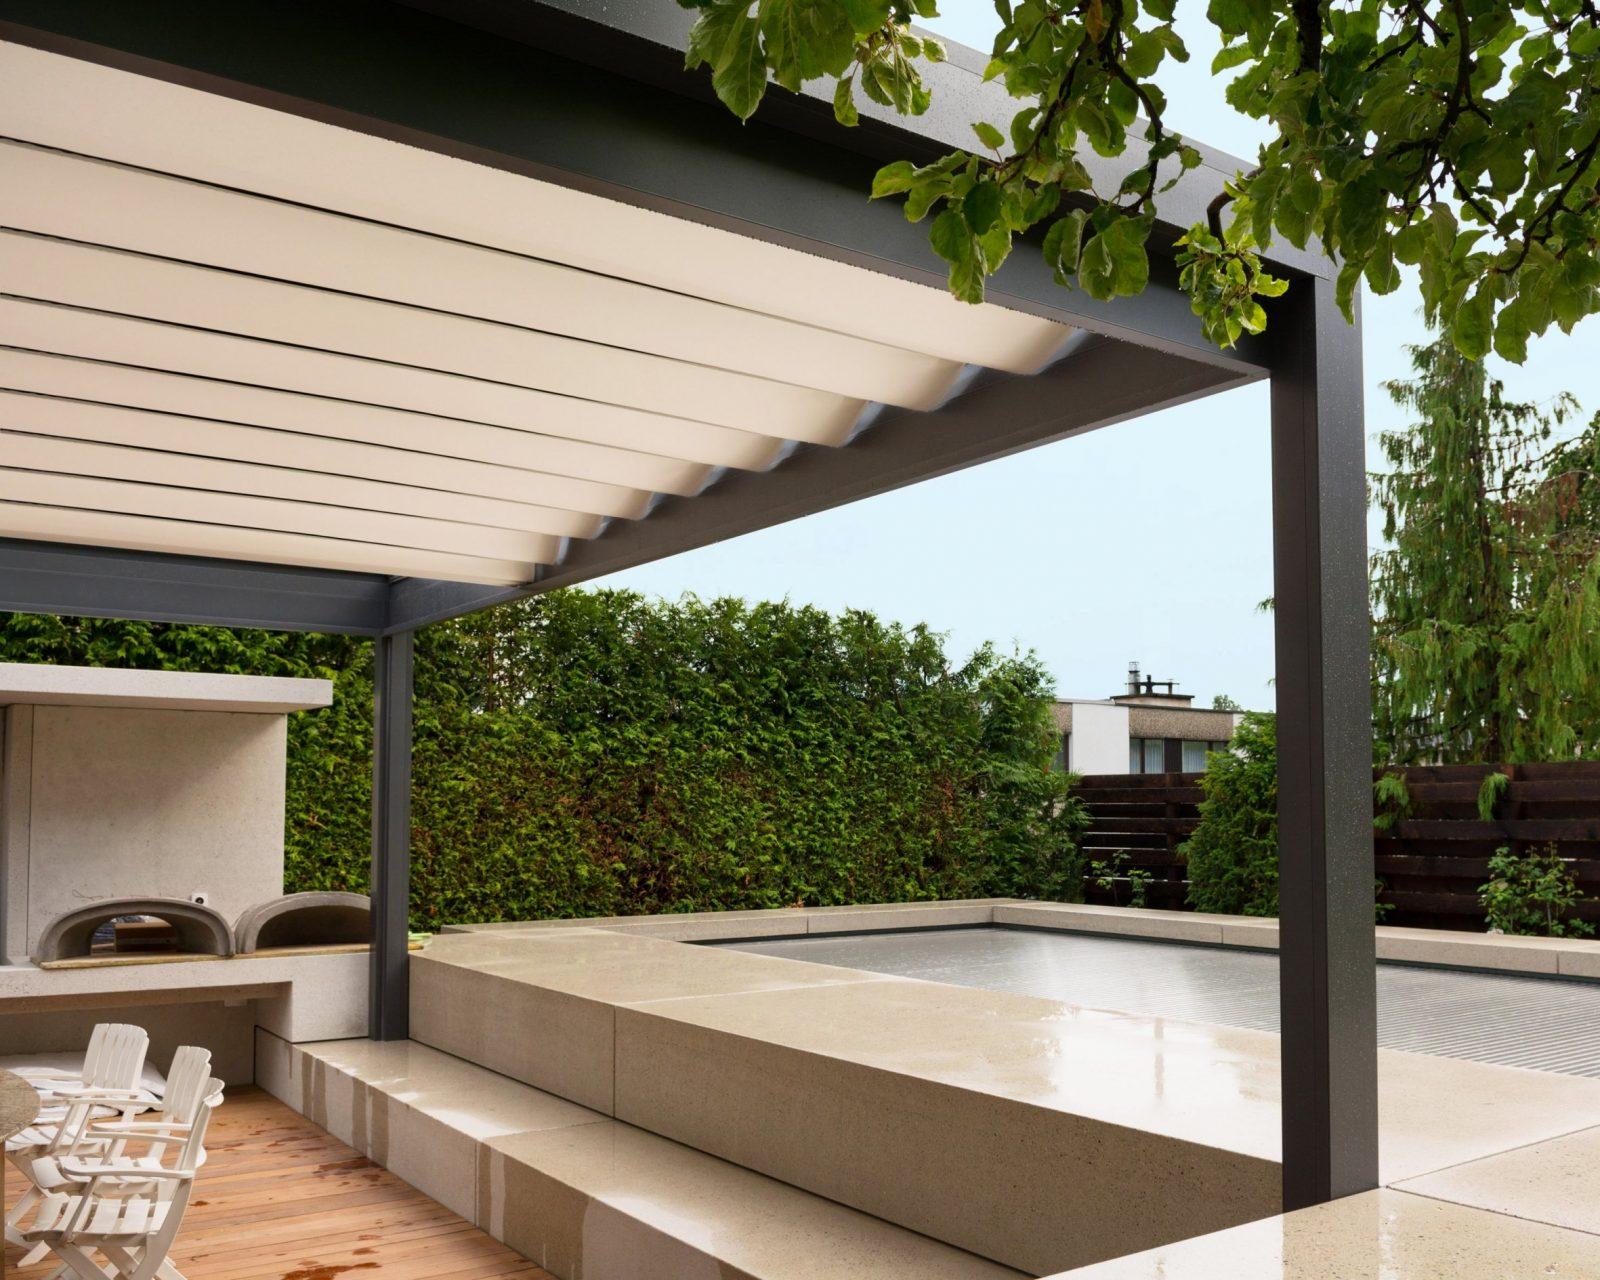 Terrassenpavillon  Melano Tp7100  Bowich von Sonnenschutz Pavillon Mit Faltdach Photo